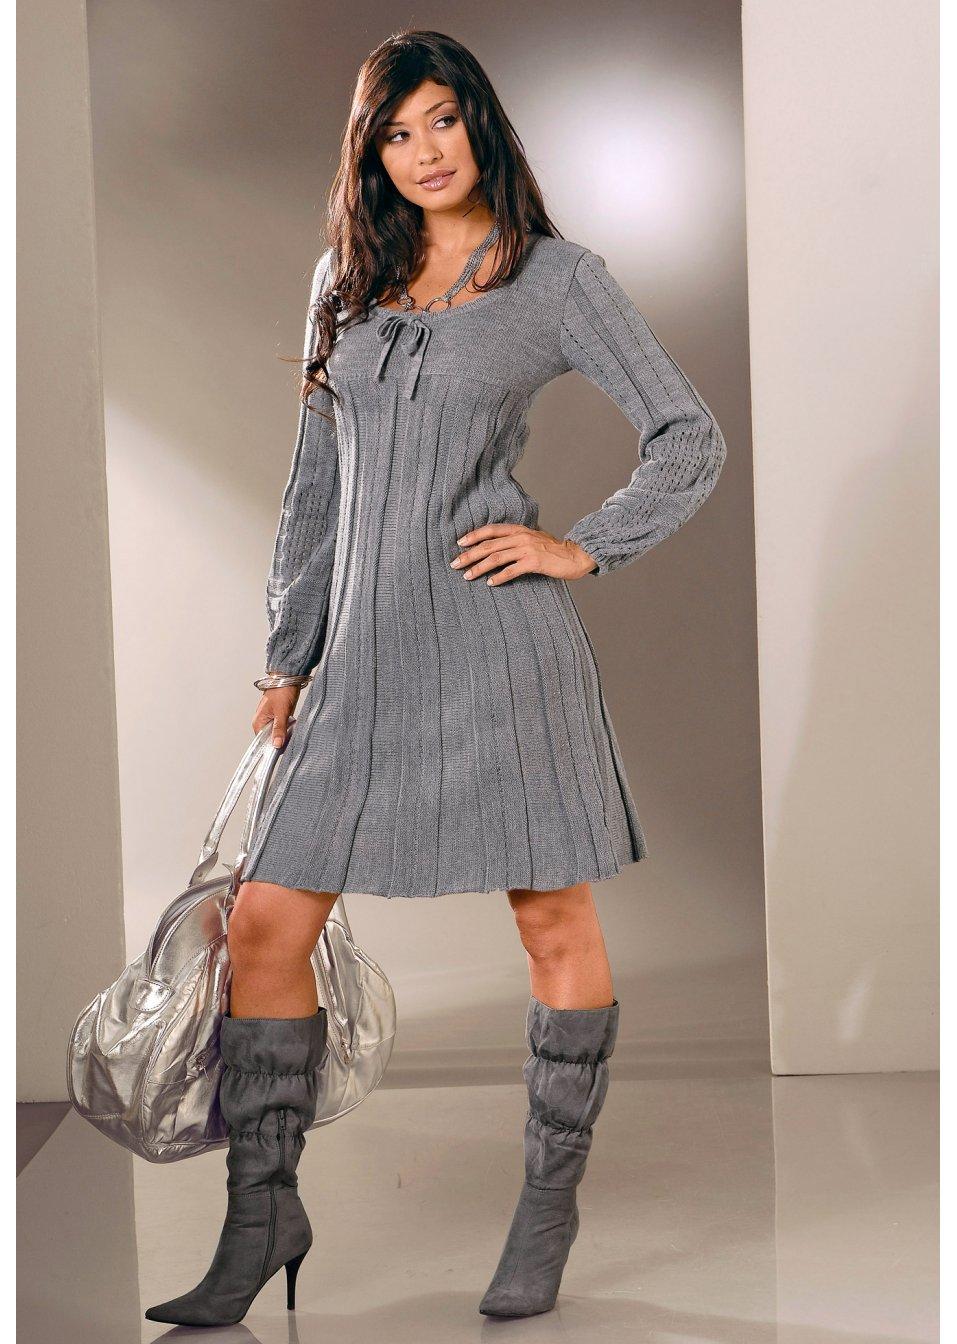 b7ecff81ca9626 Gebreide jurk karmijnrood - BODYFLIRT bestel online - bonprix-fl.be